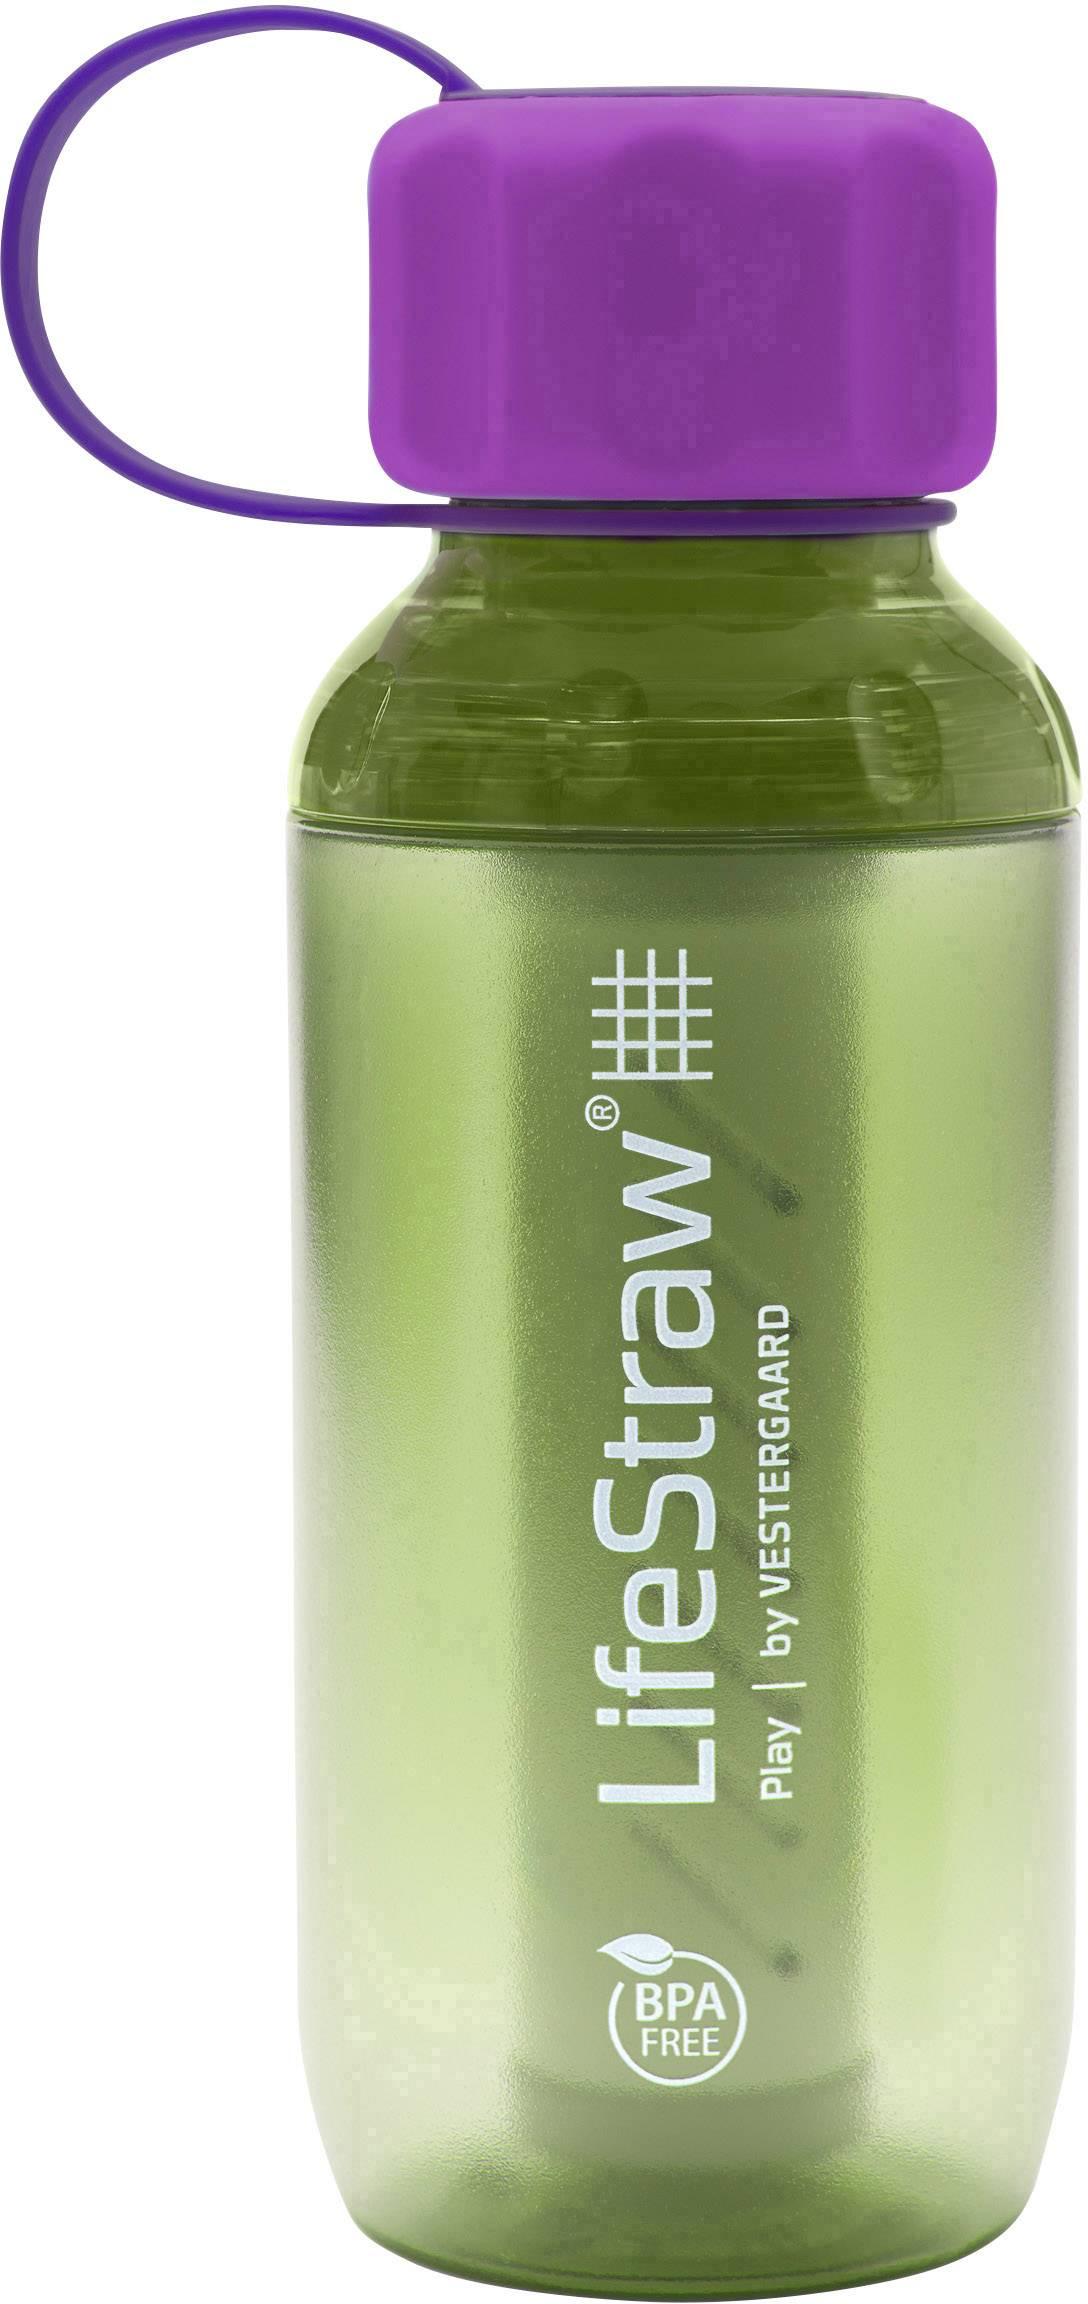 LifeStraw vodní filtr plast 006-6002129 Play 2-Stufig (lime)